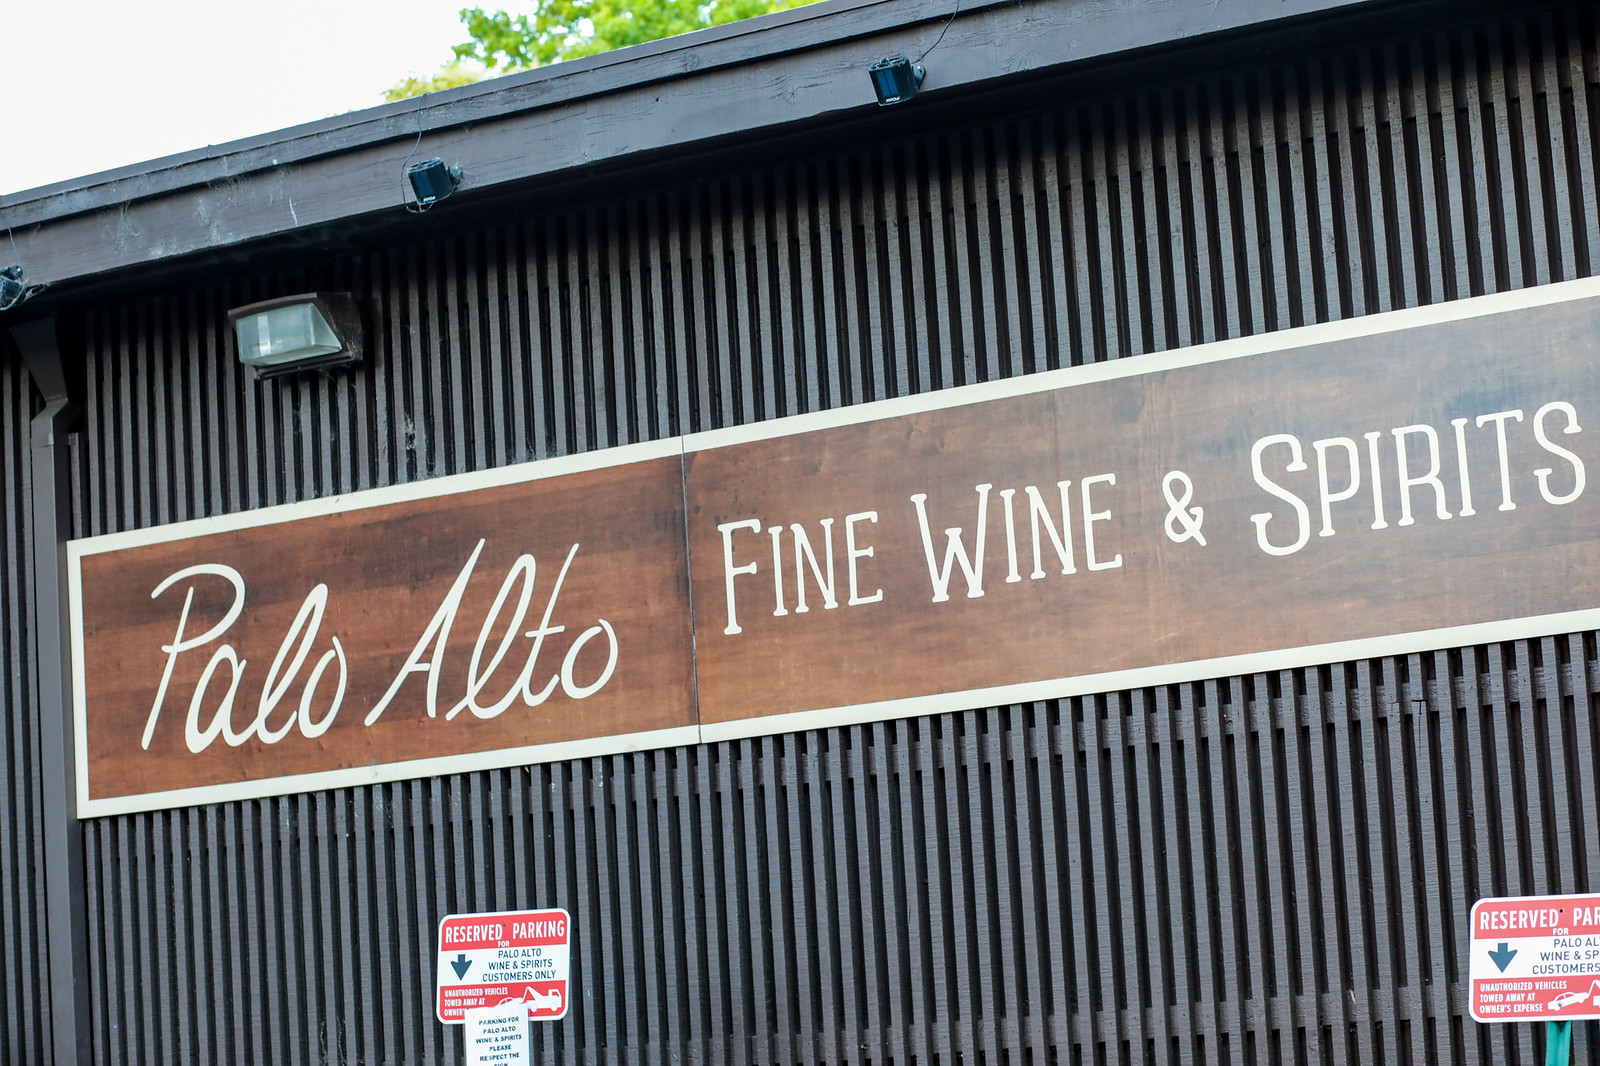 Midtown Palo Alto Blu Skye Media-1141-X3.jpg